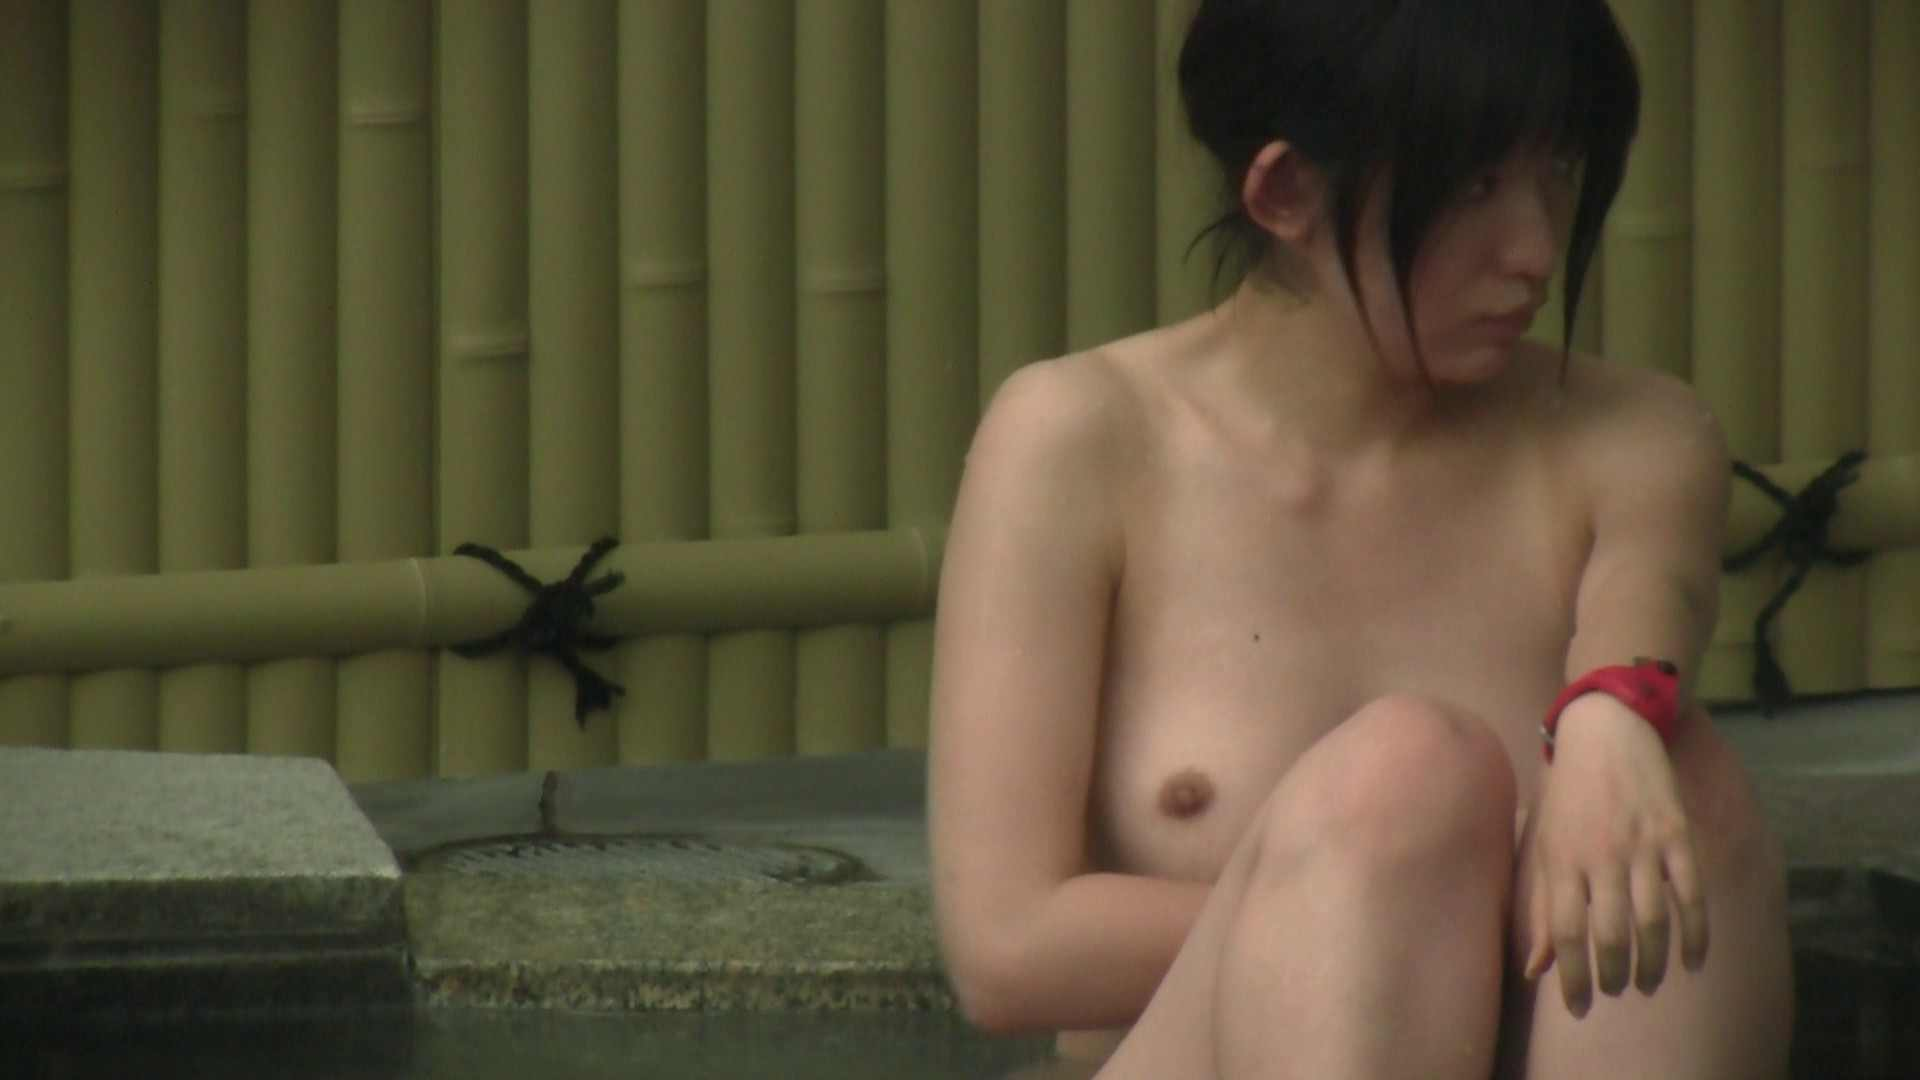 Aquaな露天風呂Vol.144 盗撮 | HなOL  93pic 76